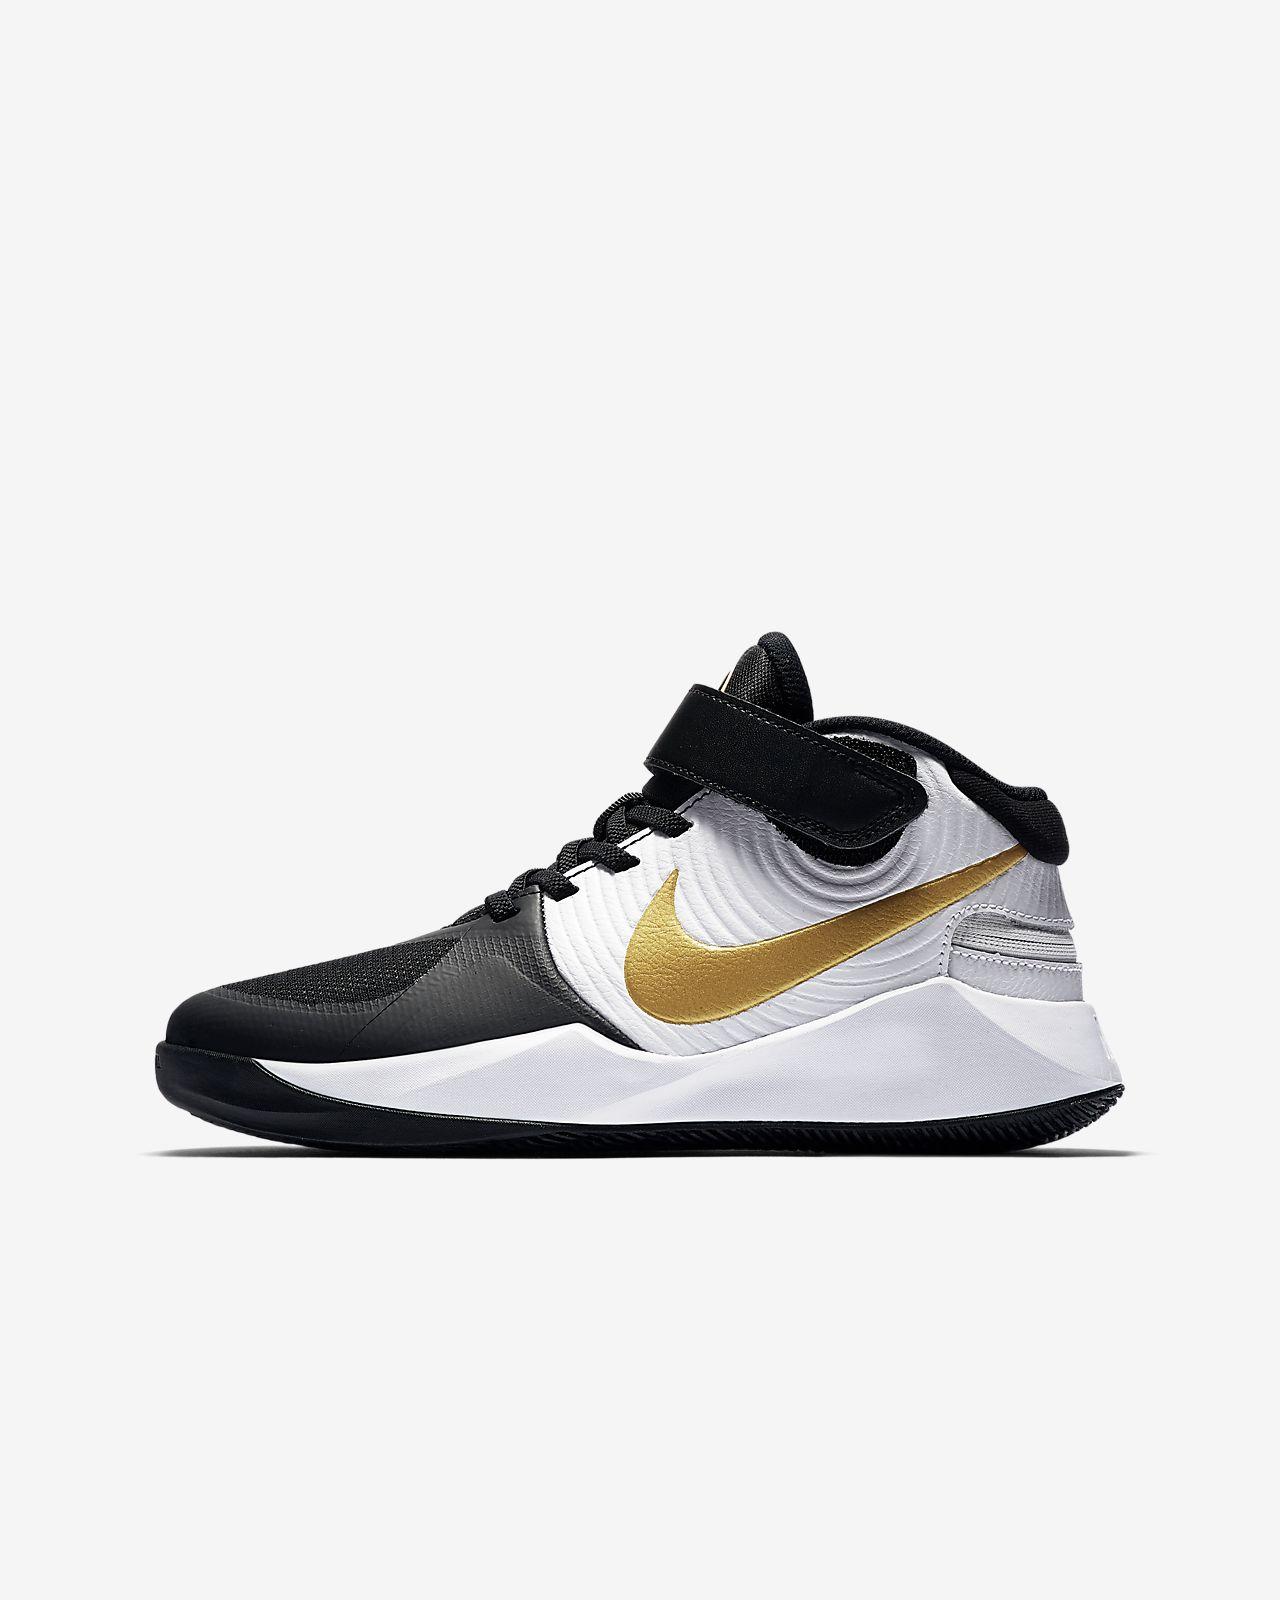 Nike Team Hustle D 9 FlyEase (GS) 大童篮球童鞋